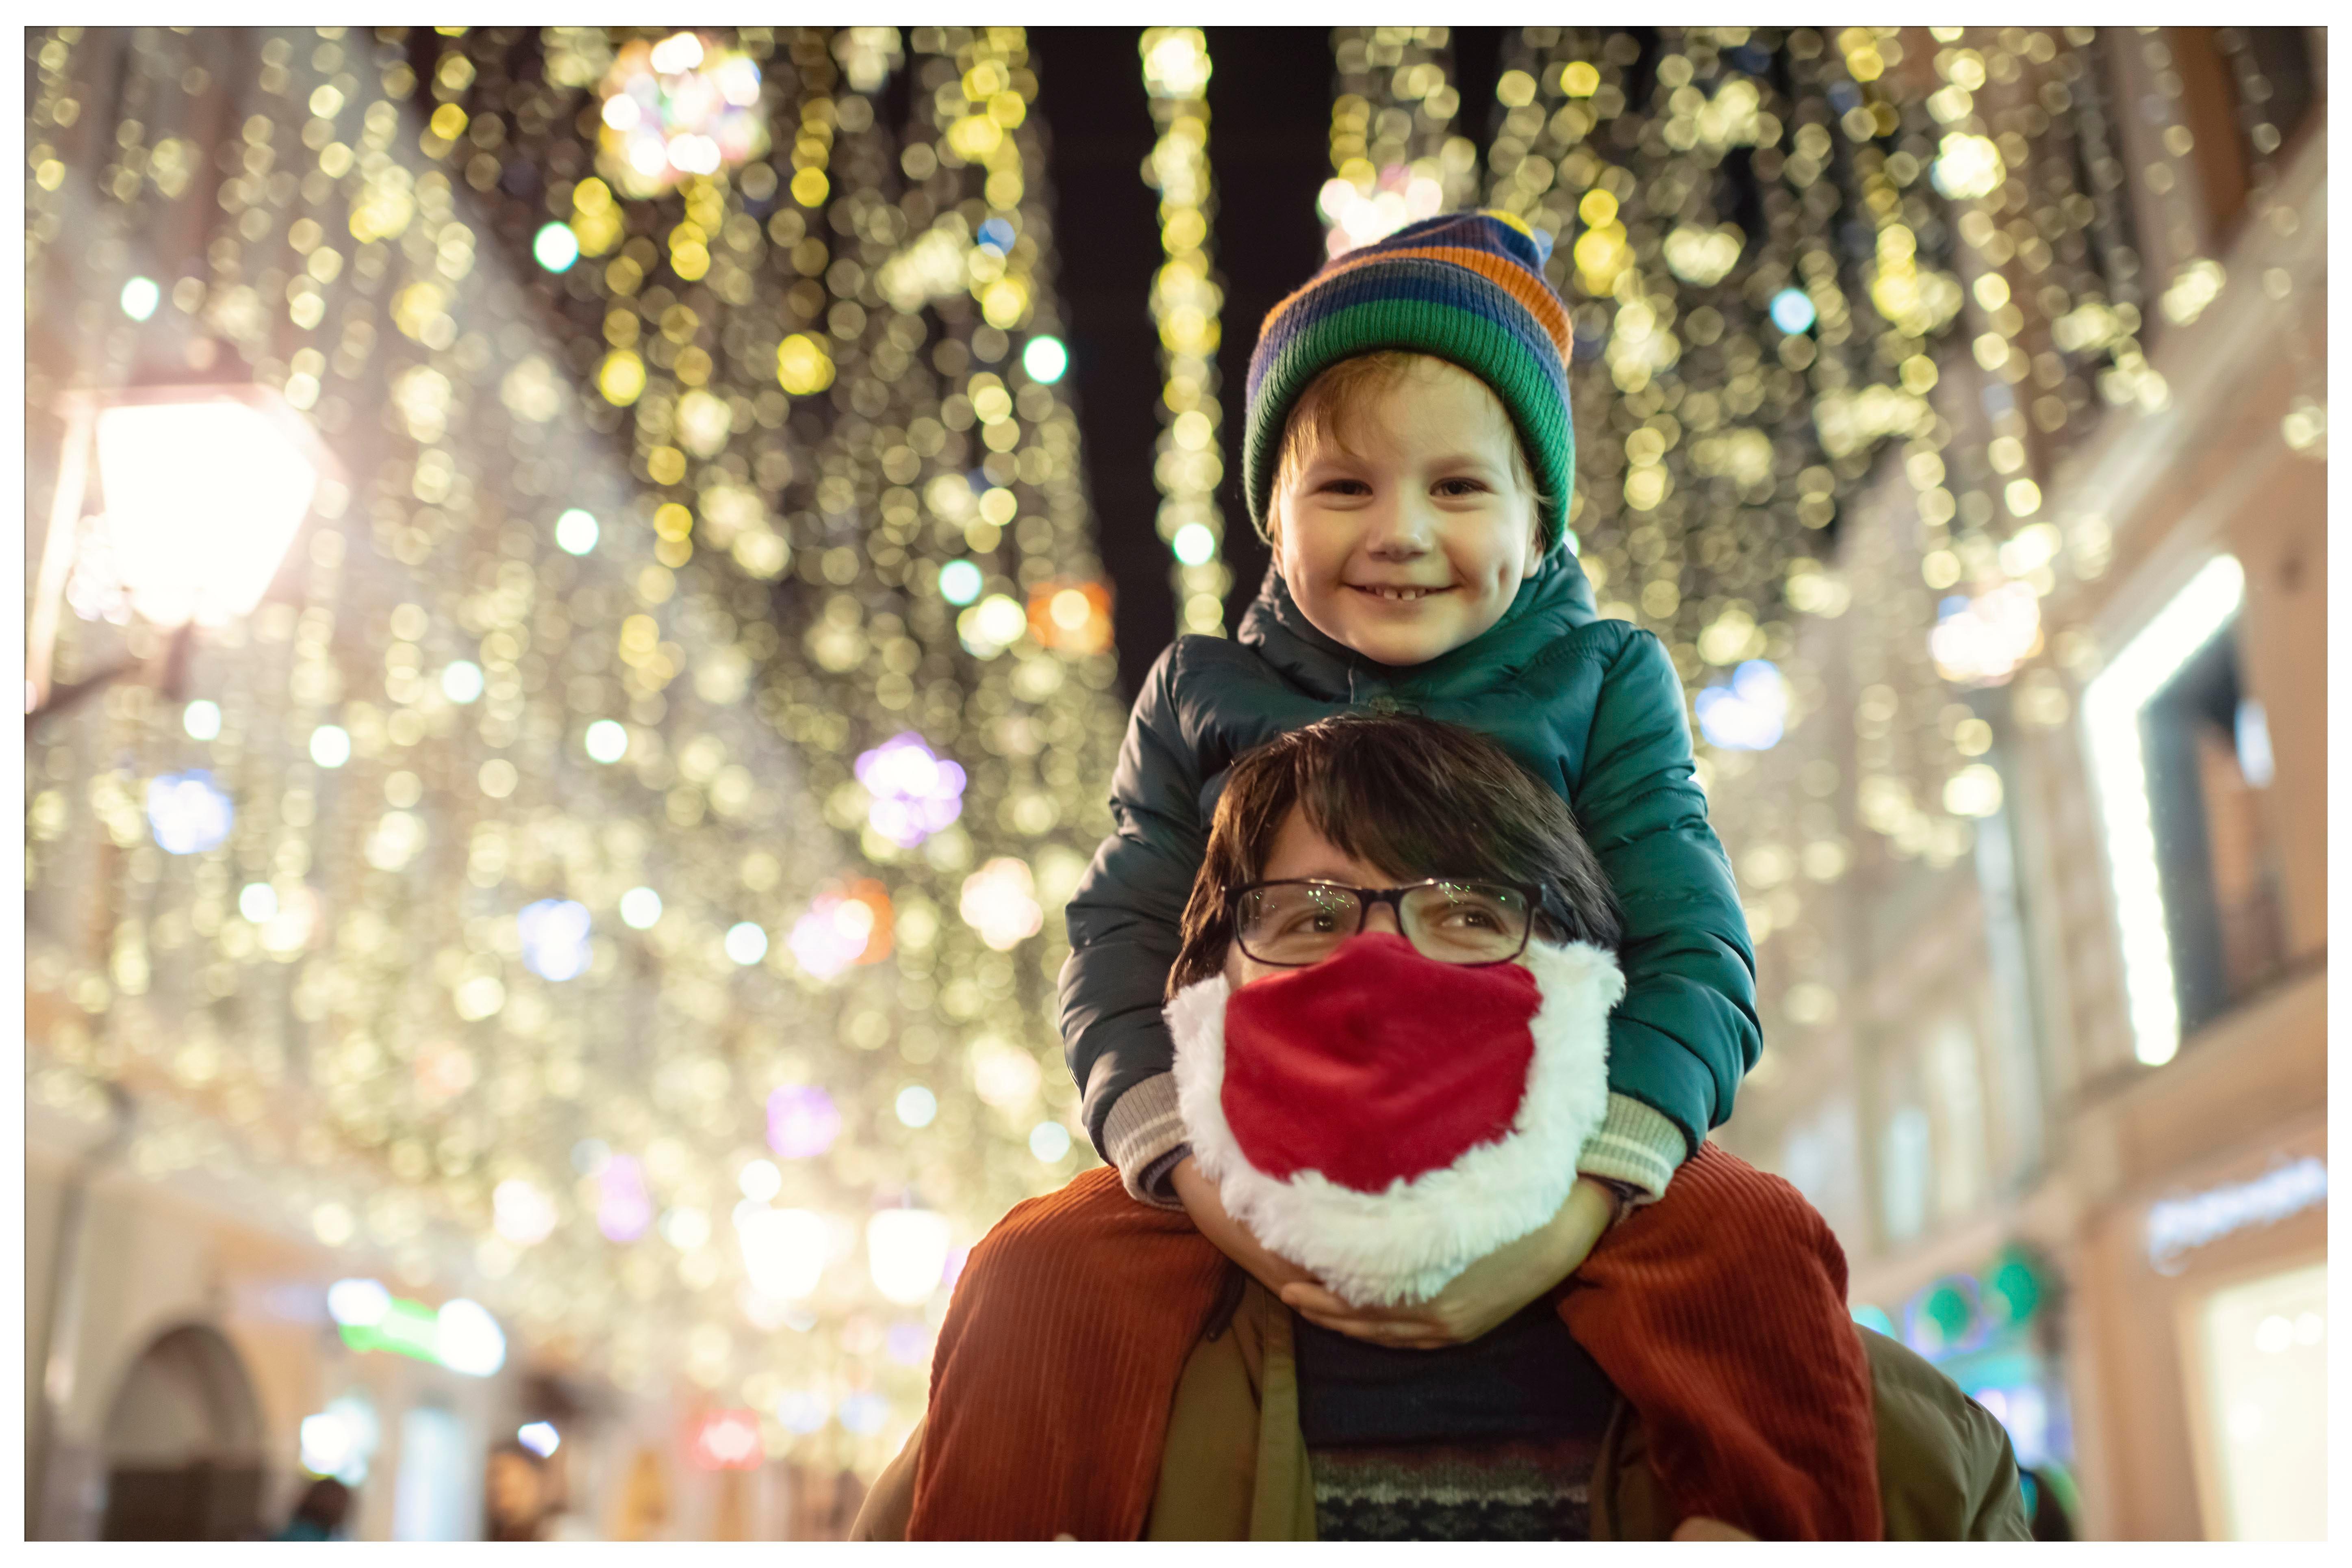 CVB_Christmas-shopping-1_c